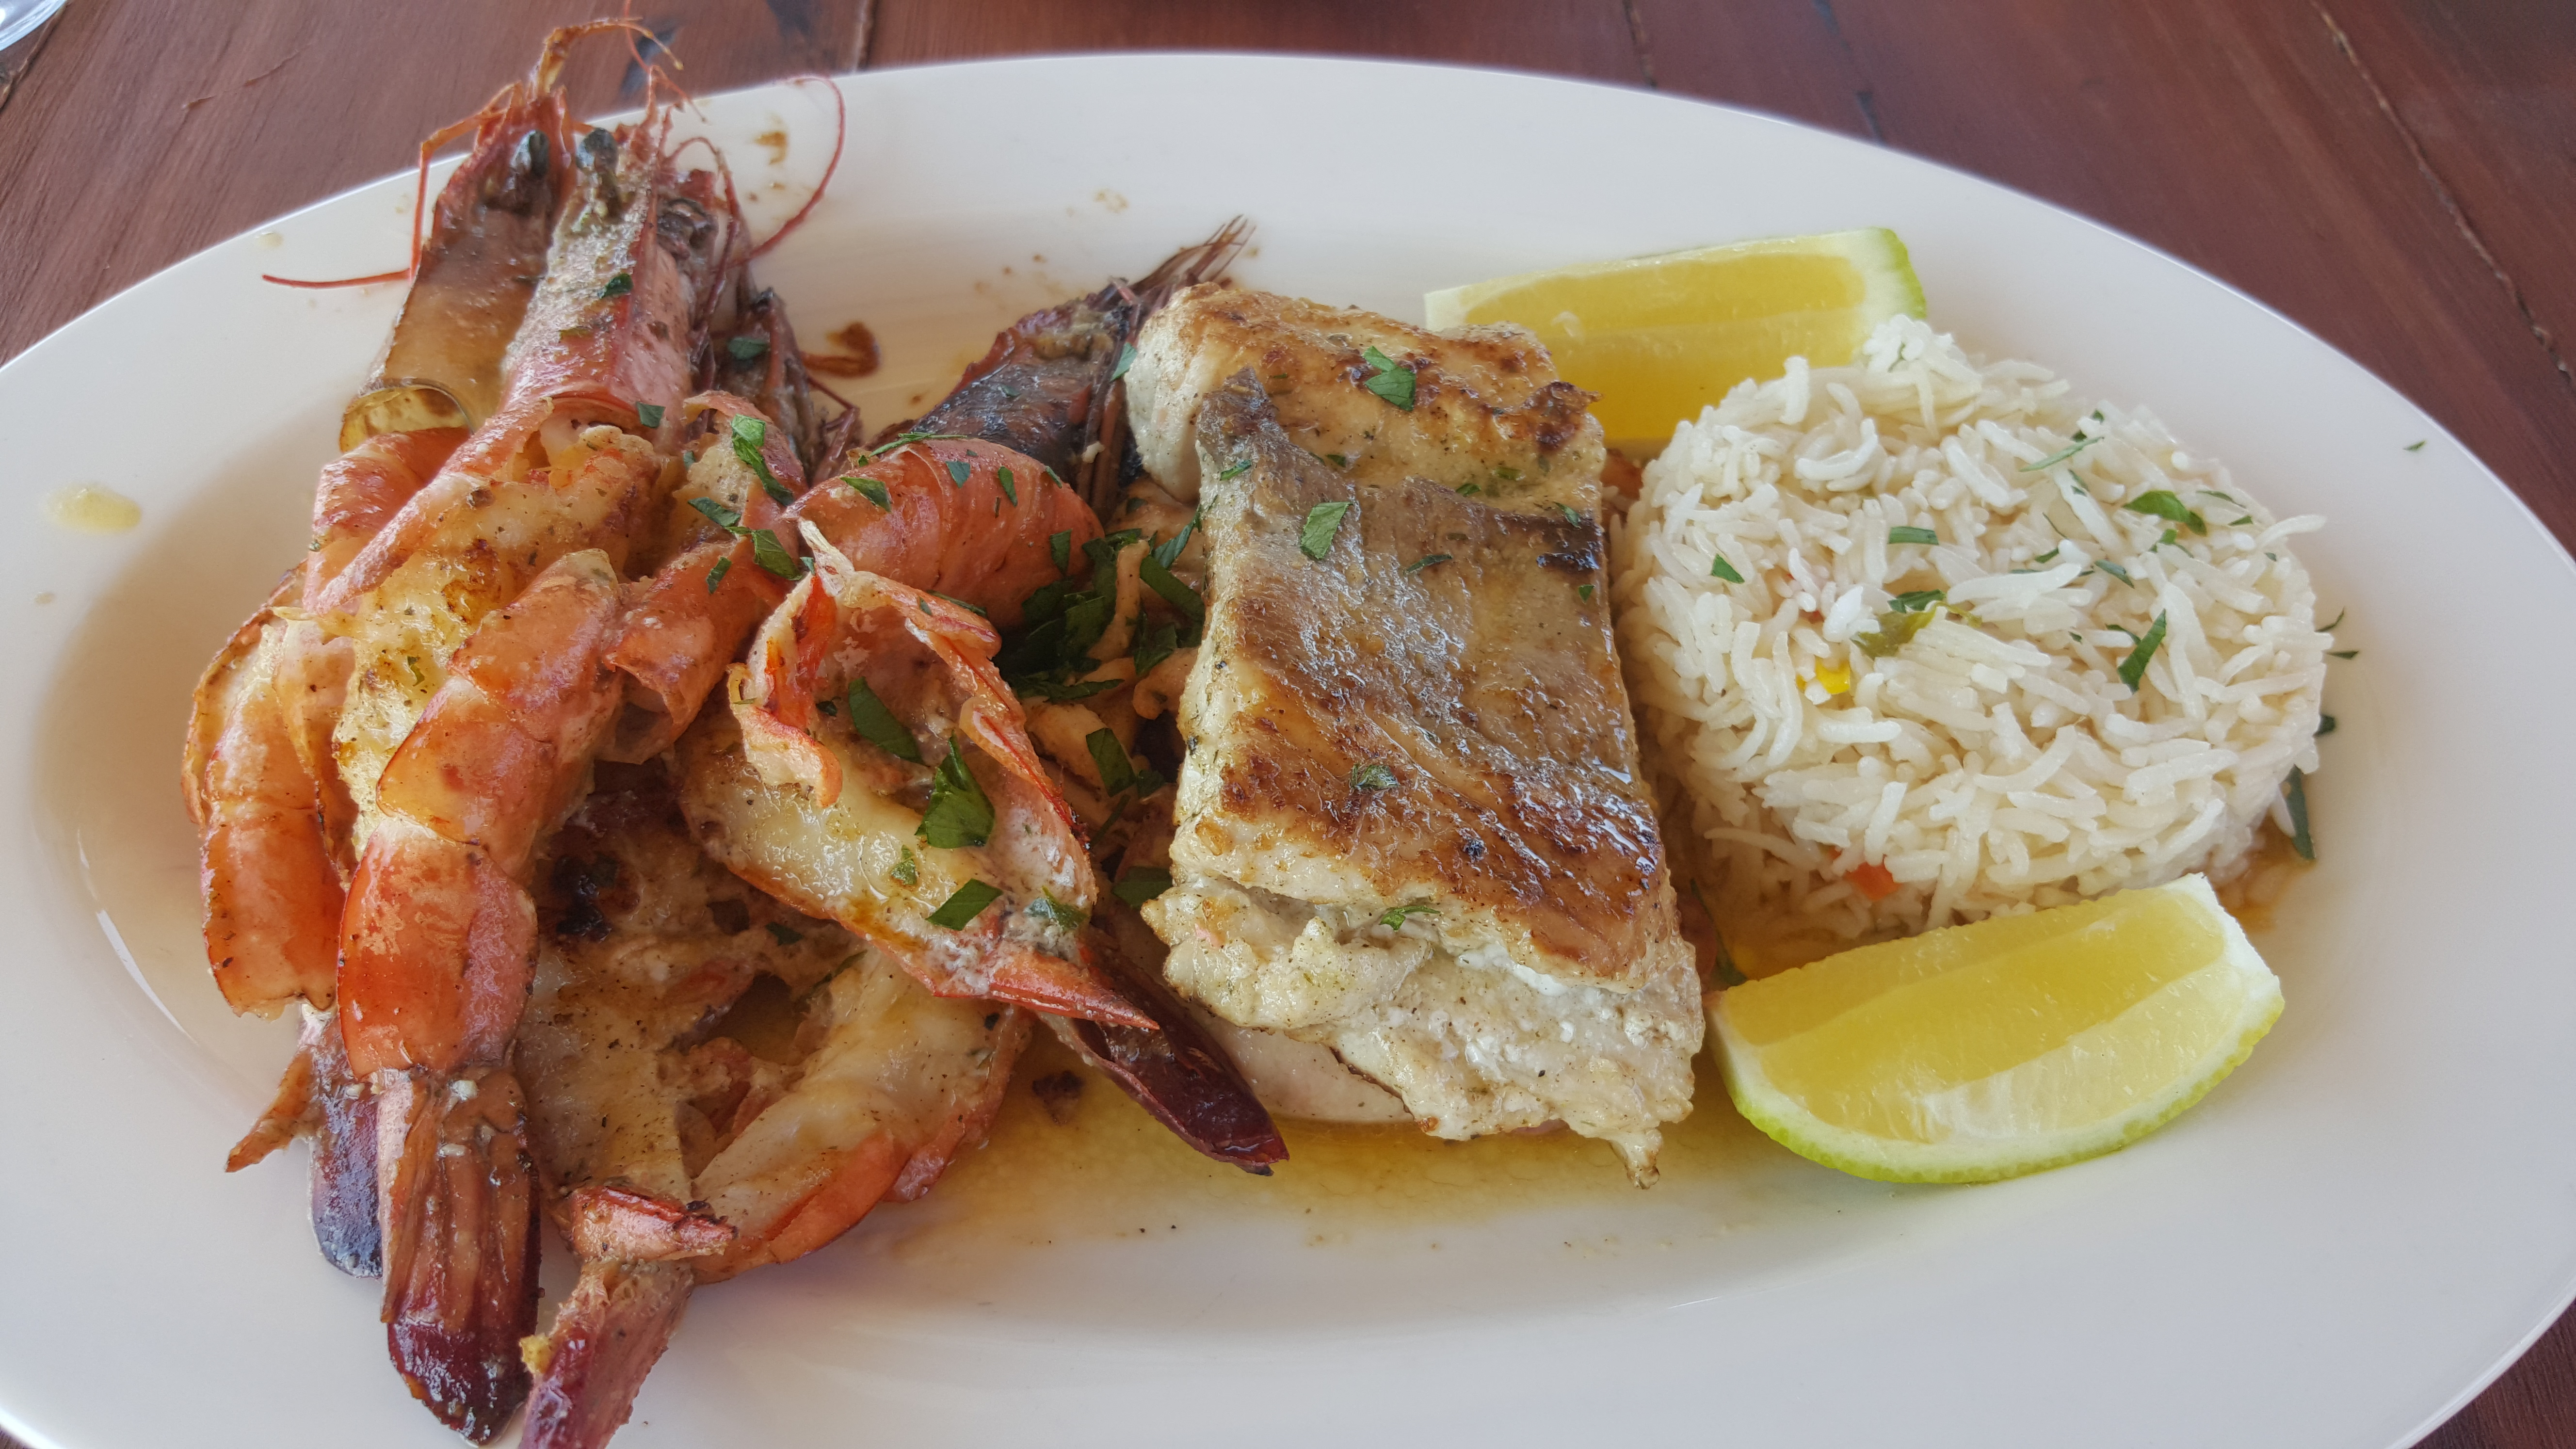 Comida moçambicada: frutos do mar a rodo e especiarias de personalidade